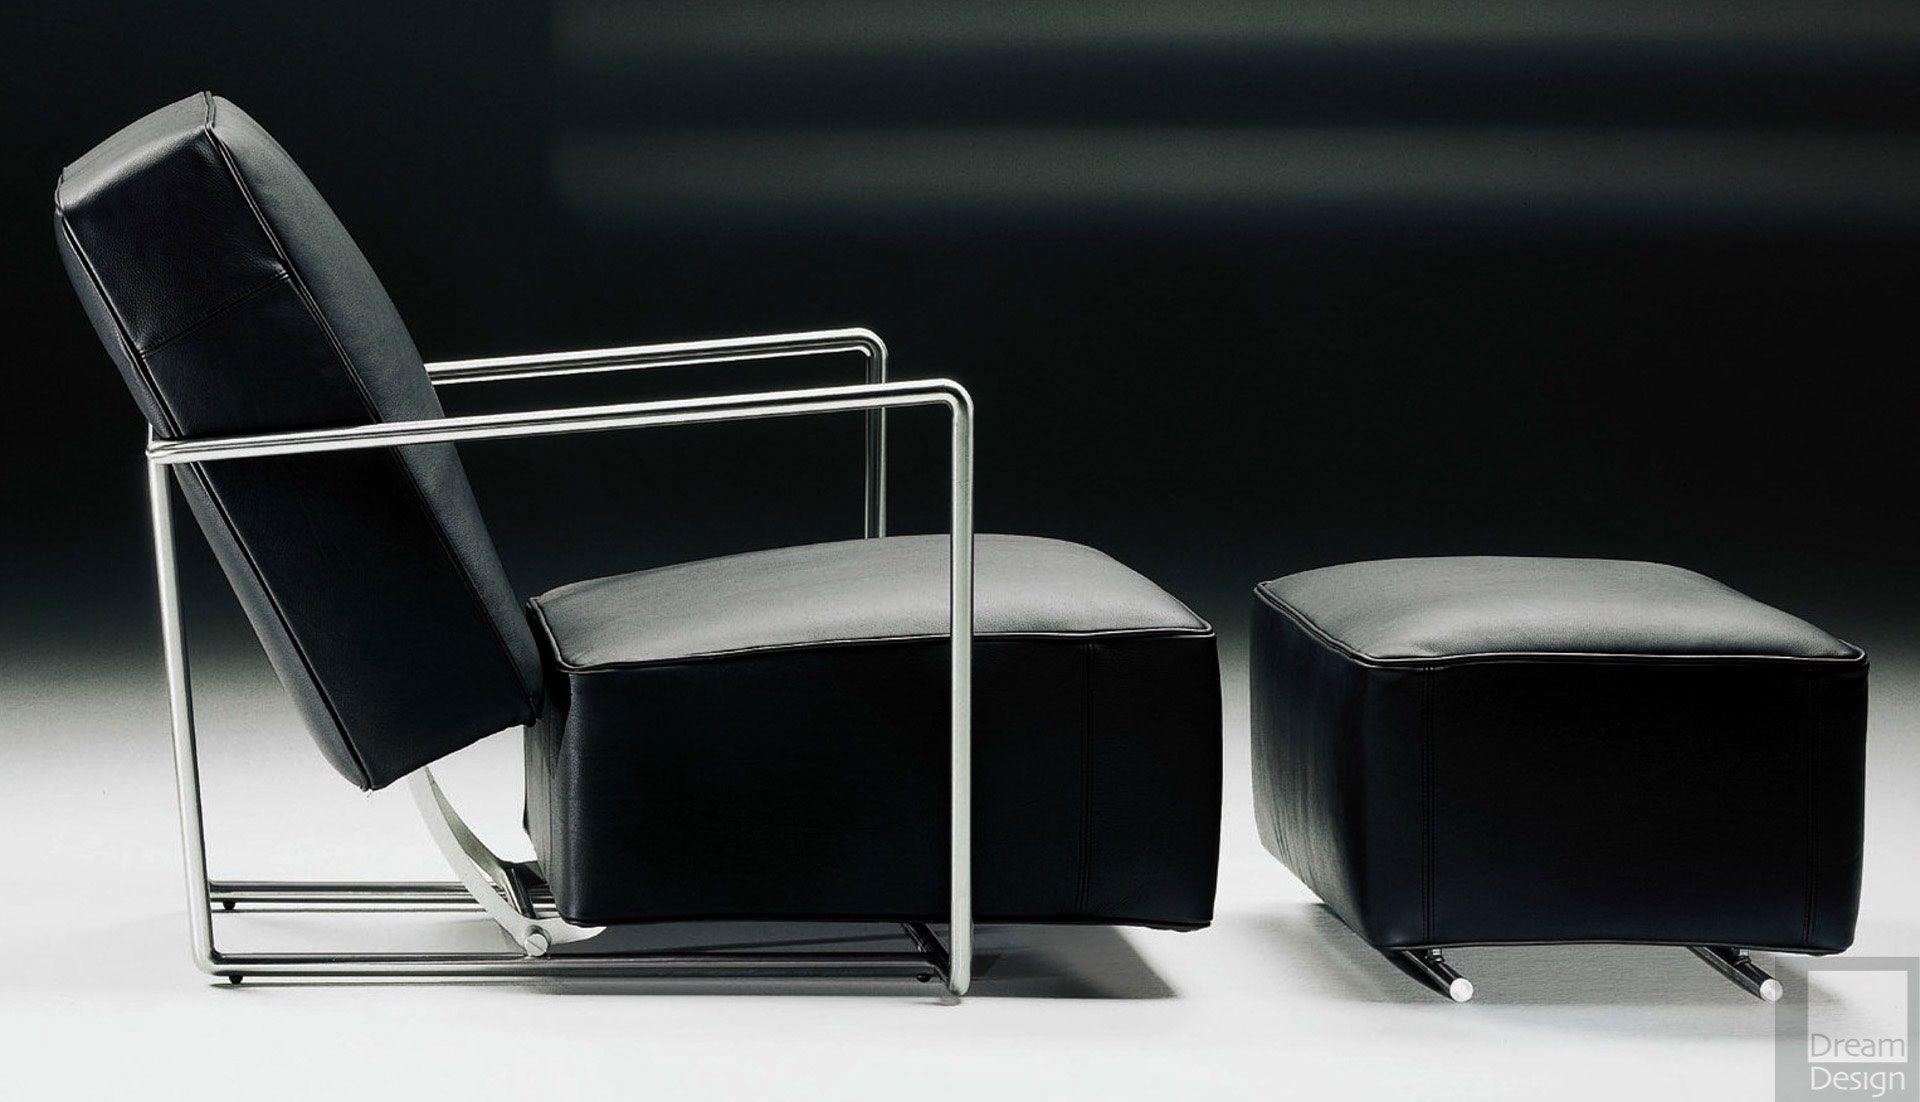 Flexform A B C Armchair By Antonio Citterio Everything But Ordinary Oversized Chair Living Room Contemporary Armchair Flexform